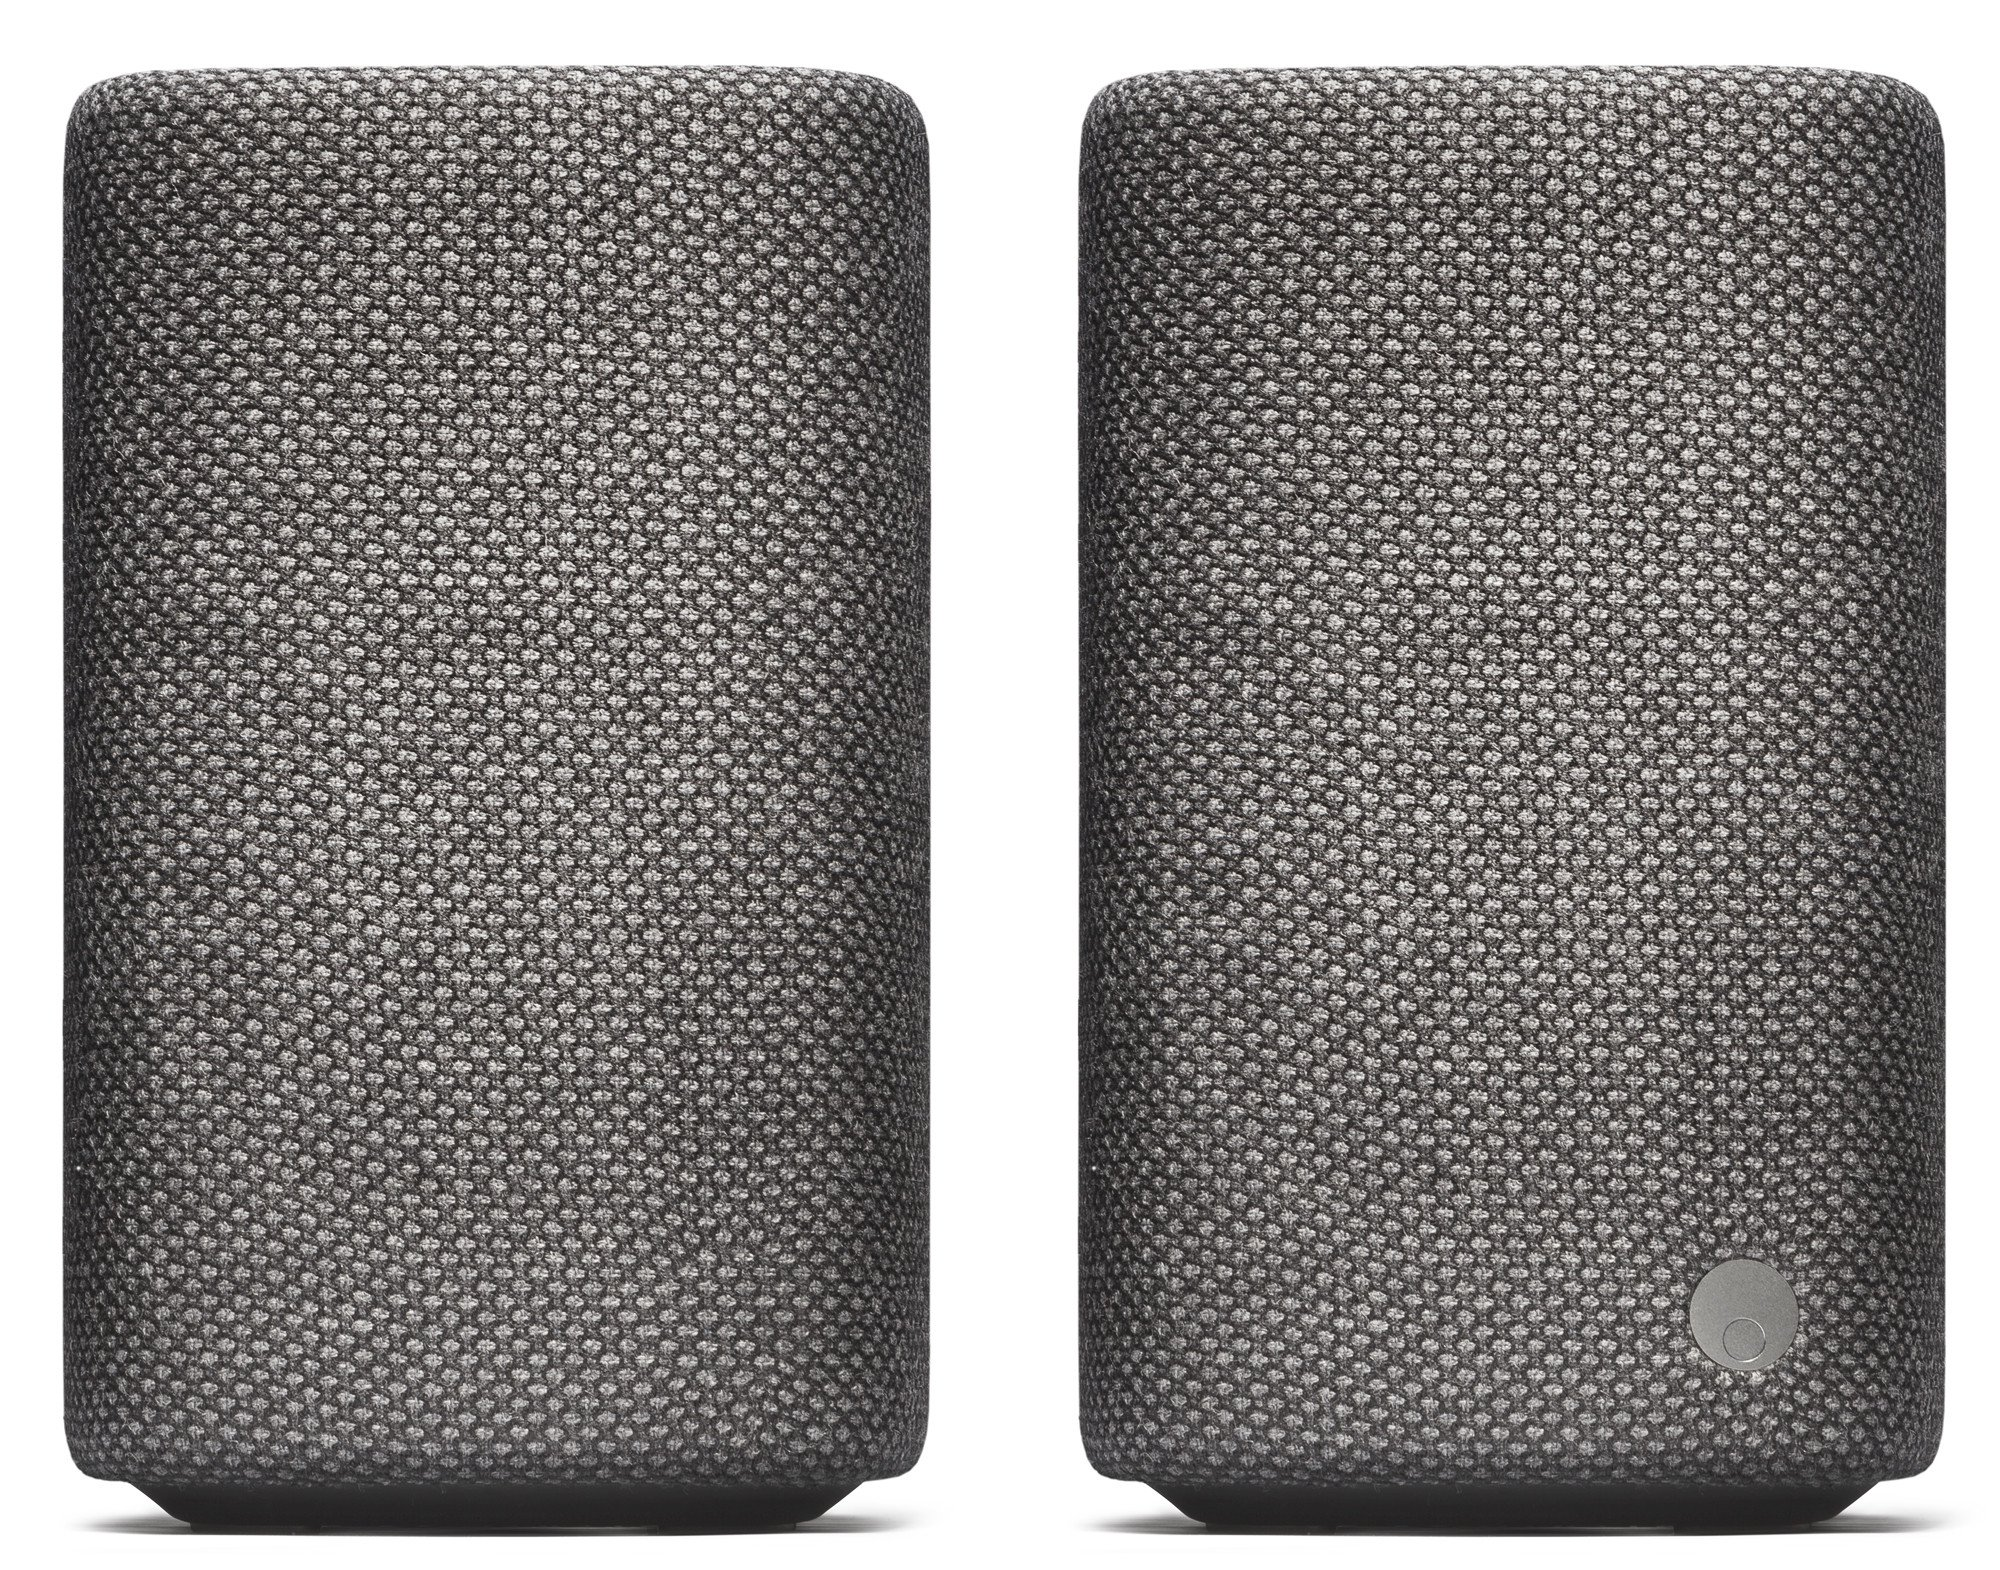 Yoyo (M) - Enceintes Bluetooth Stéréo portables | Cambridge Audio